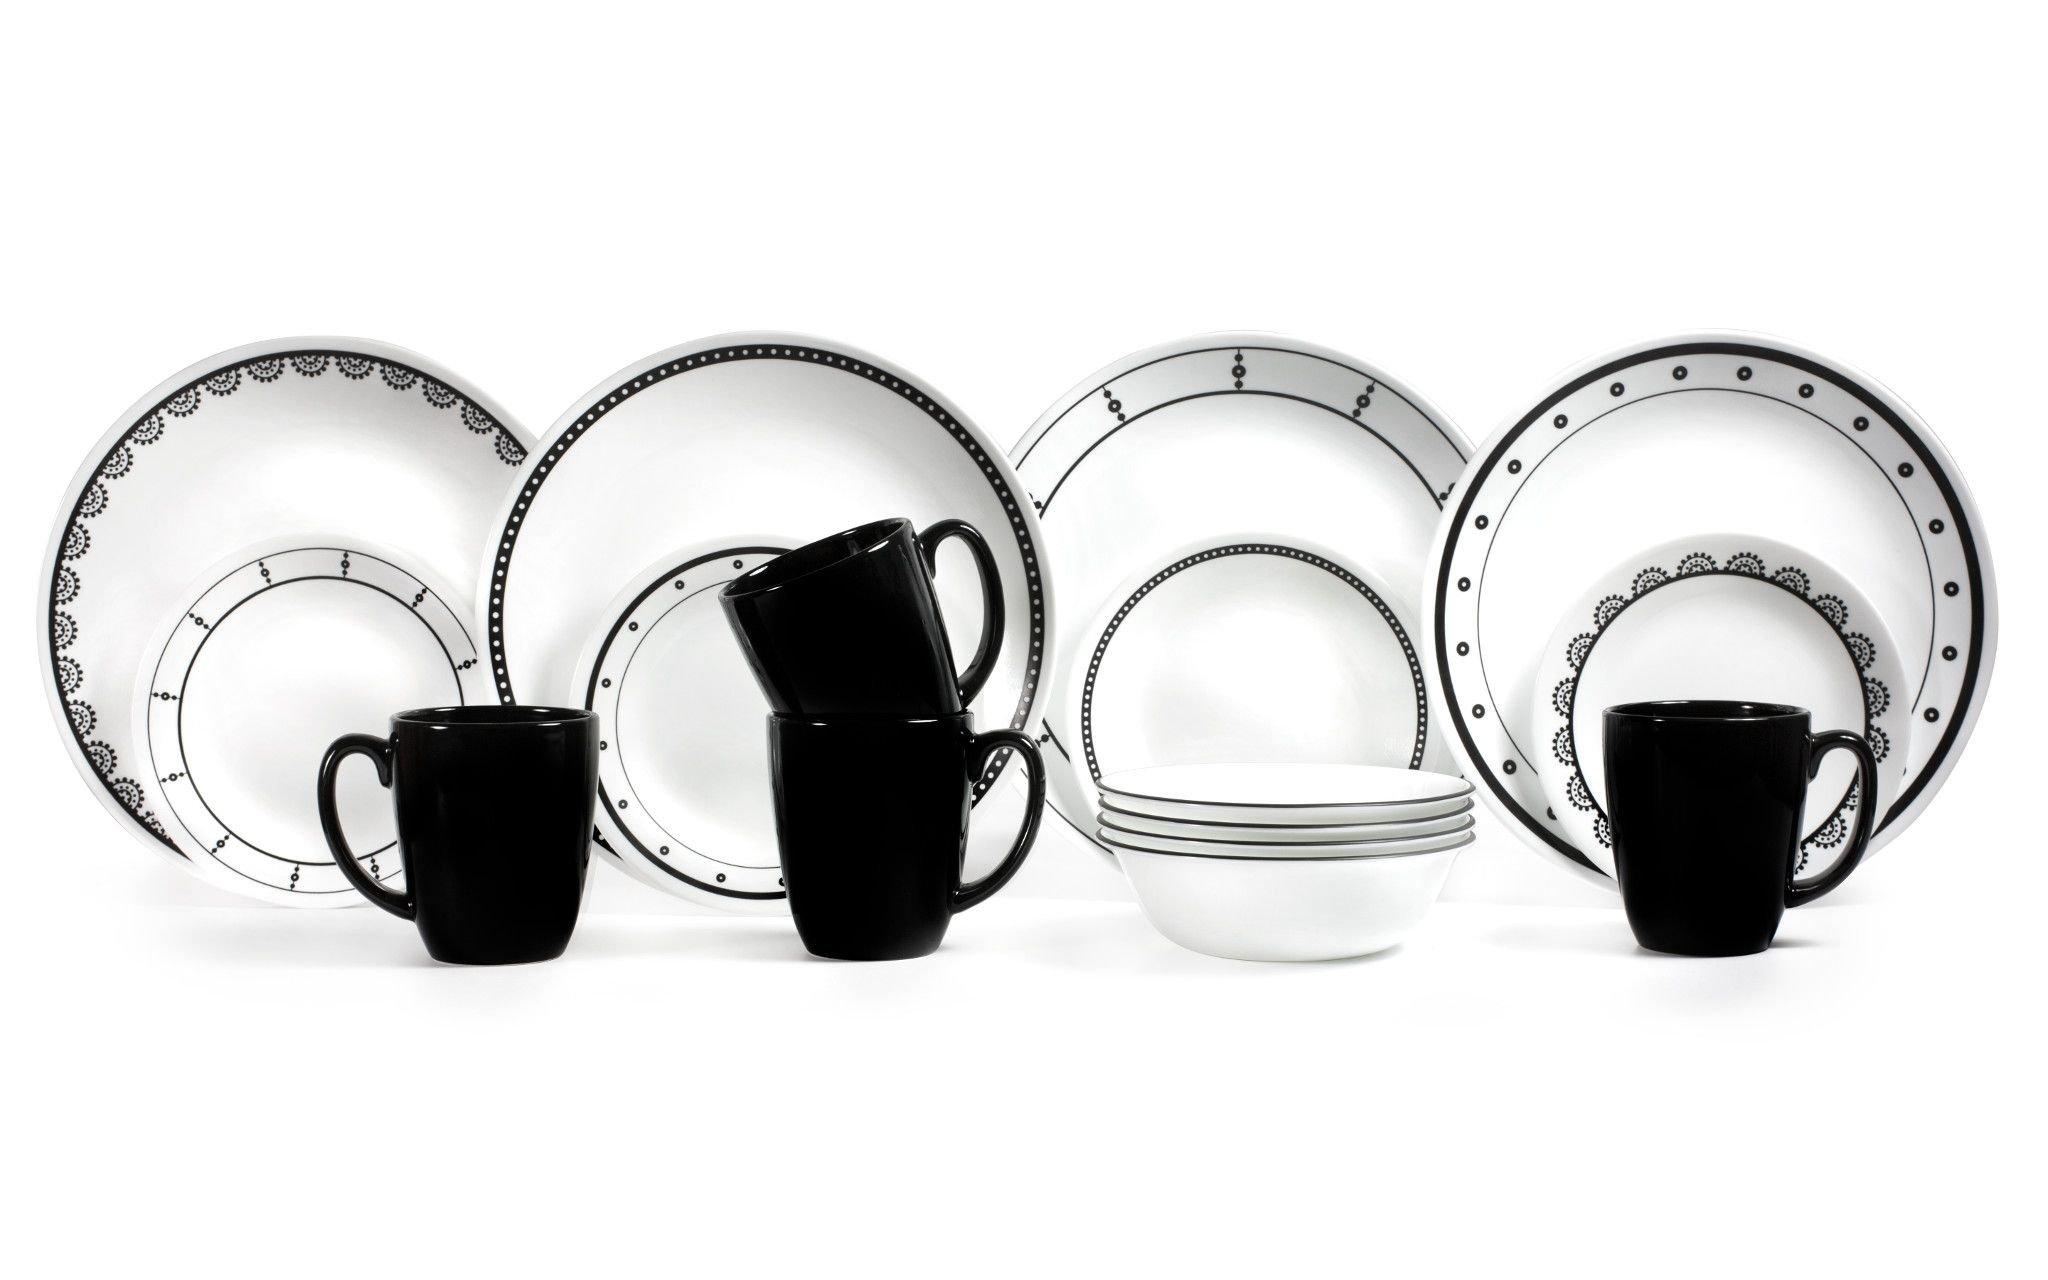 Corelle 1131599 Livingware Black and White 16-Piece Dinnerware Set, 5.75 x 11.25 x 11.00, by Corelle (Image #1)